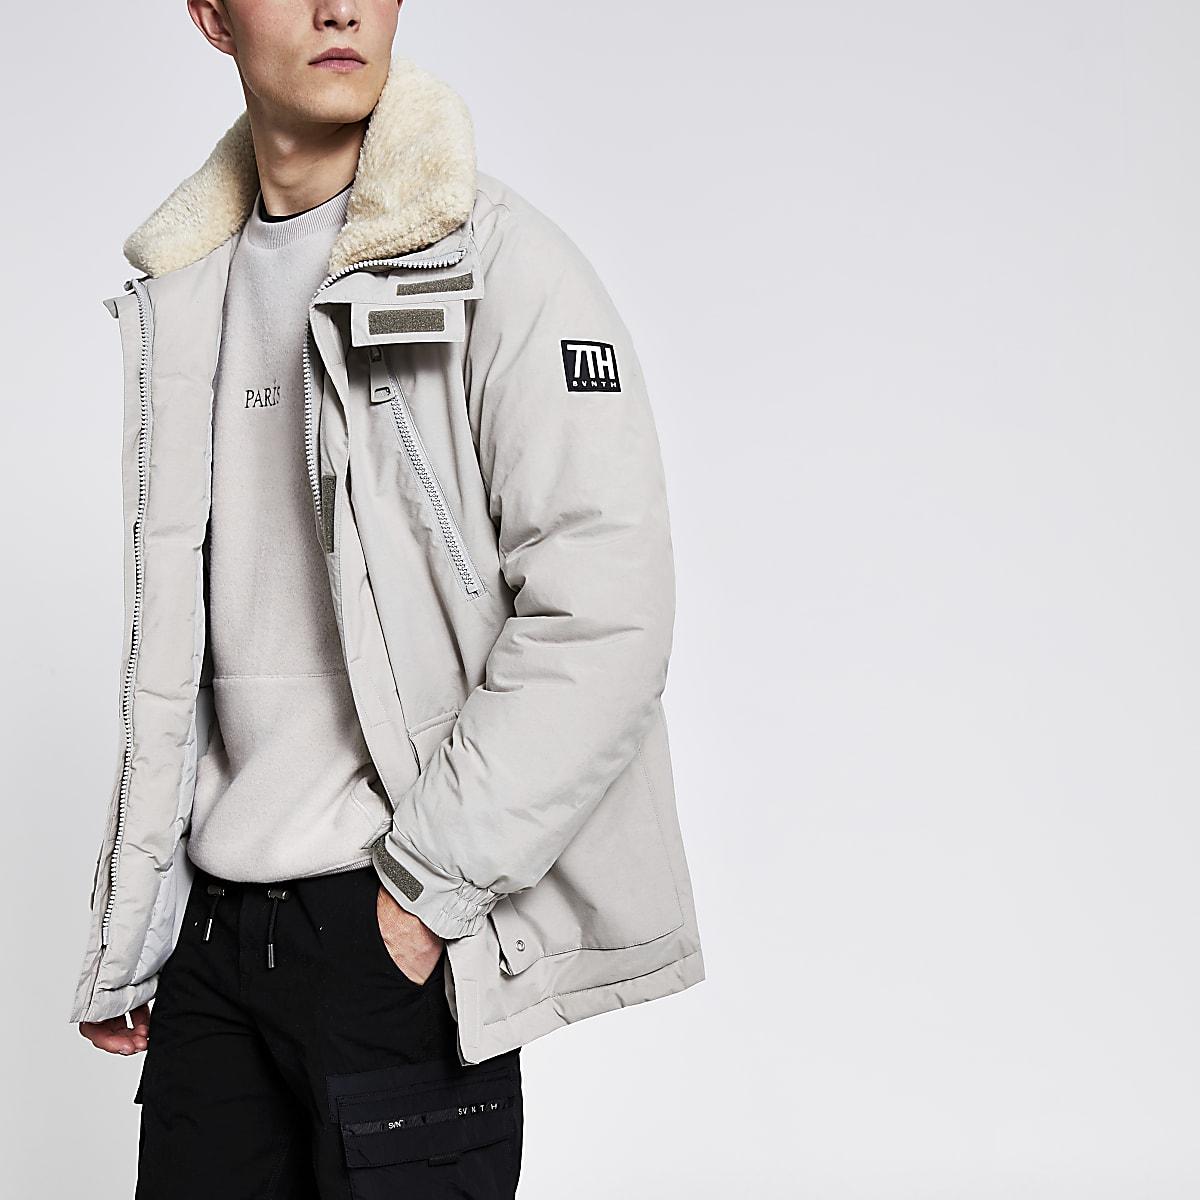 Grey Svnth borg collar parka coat